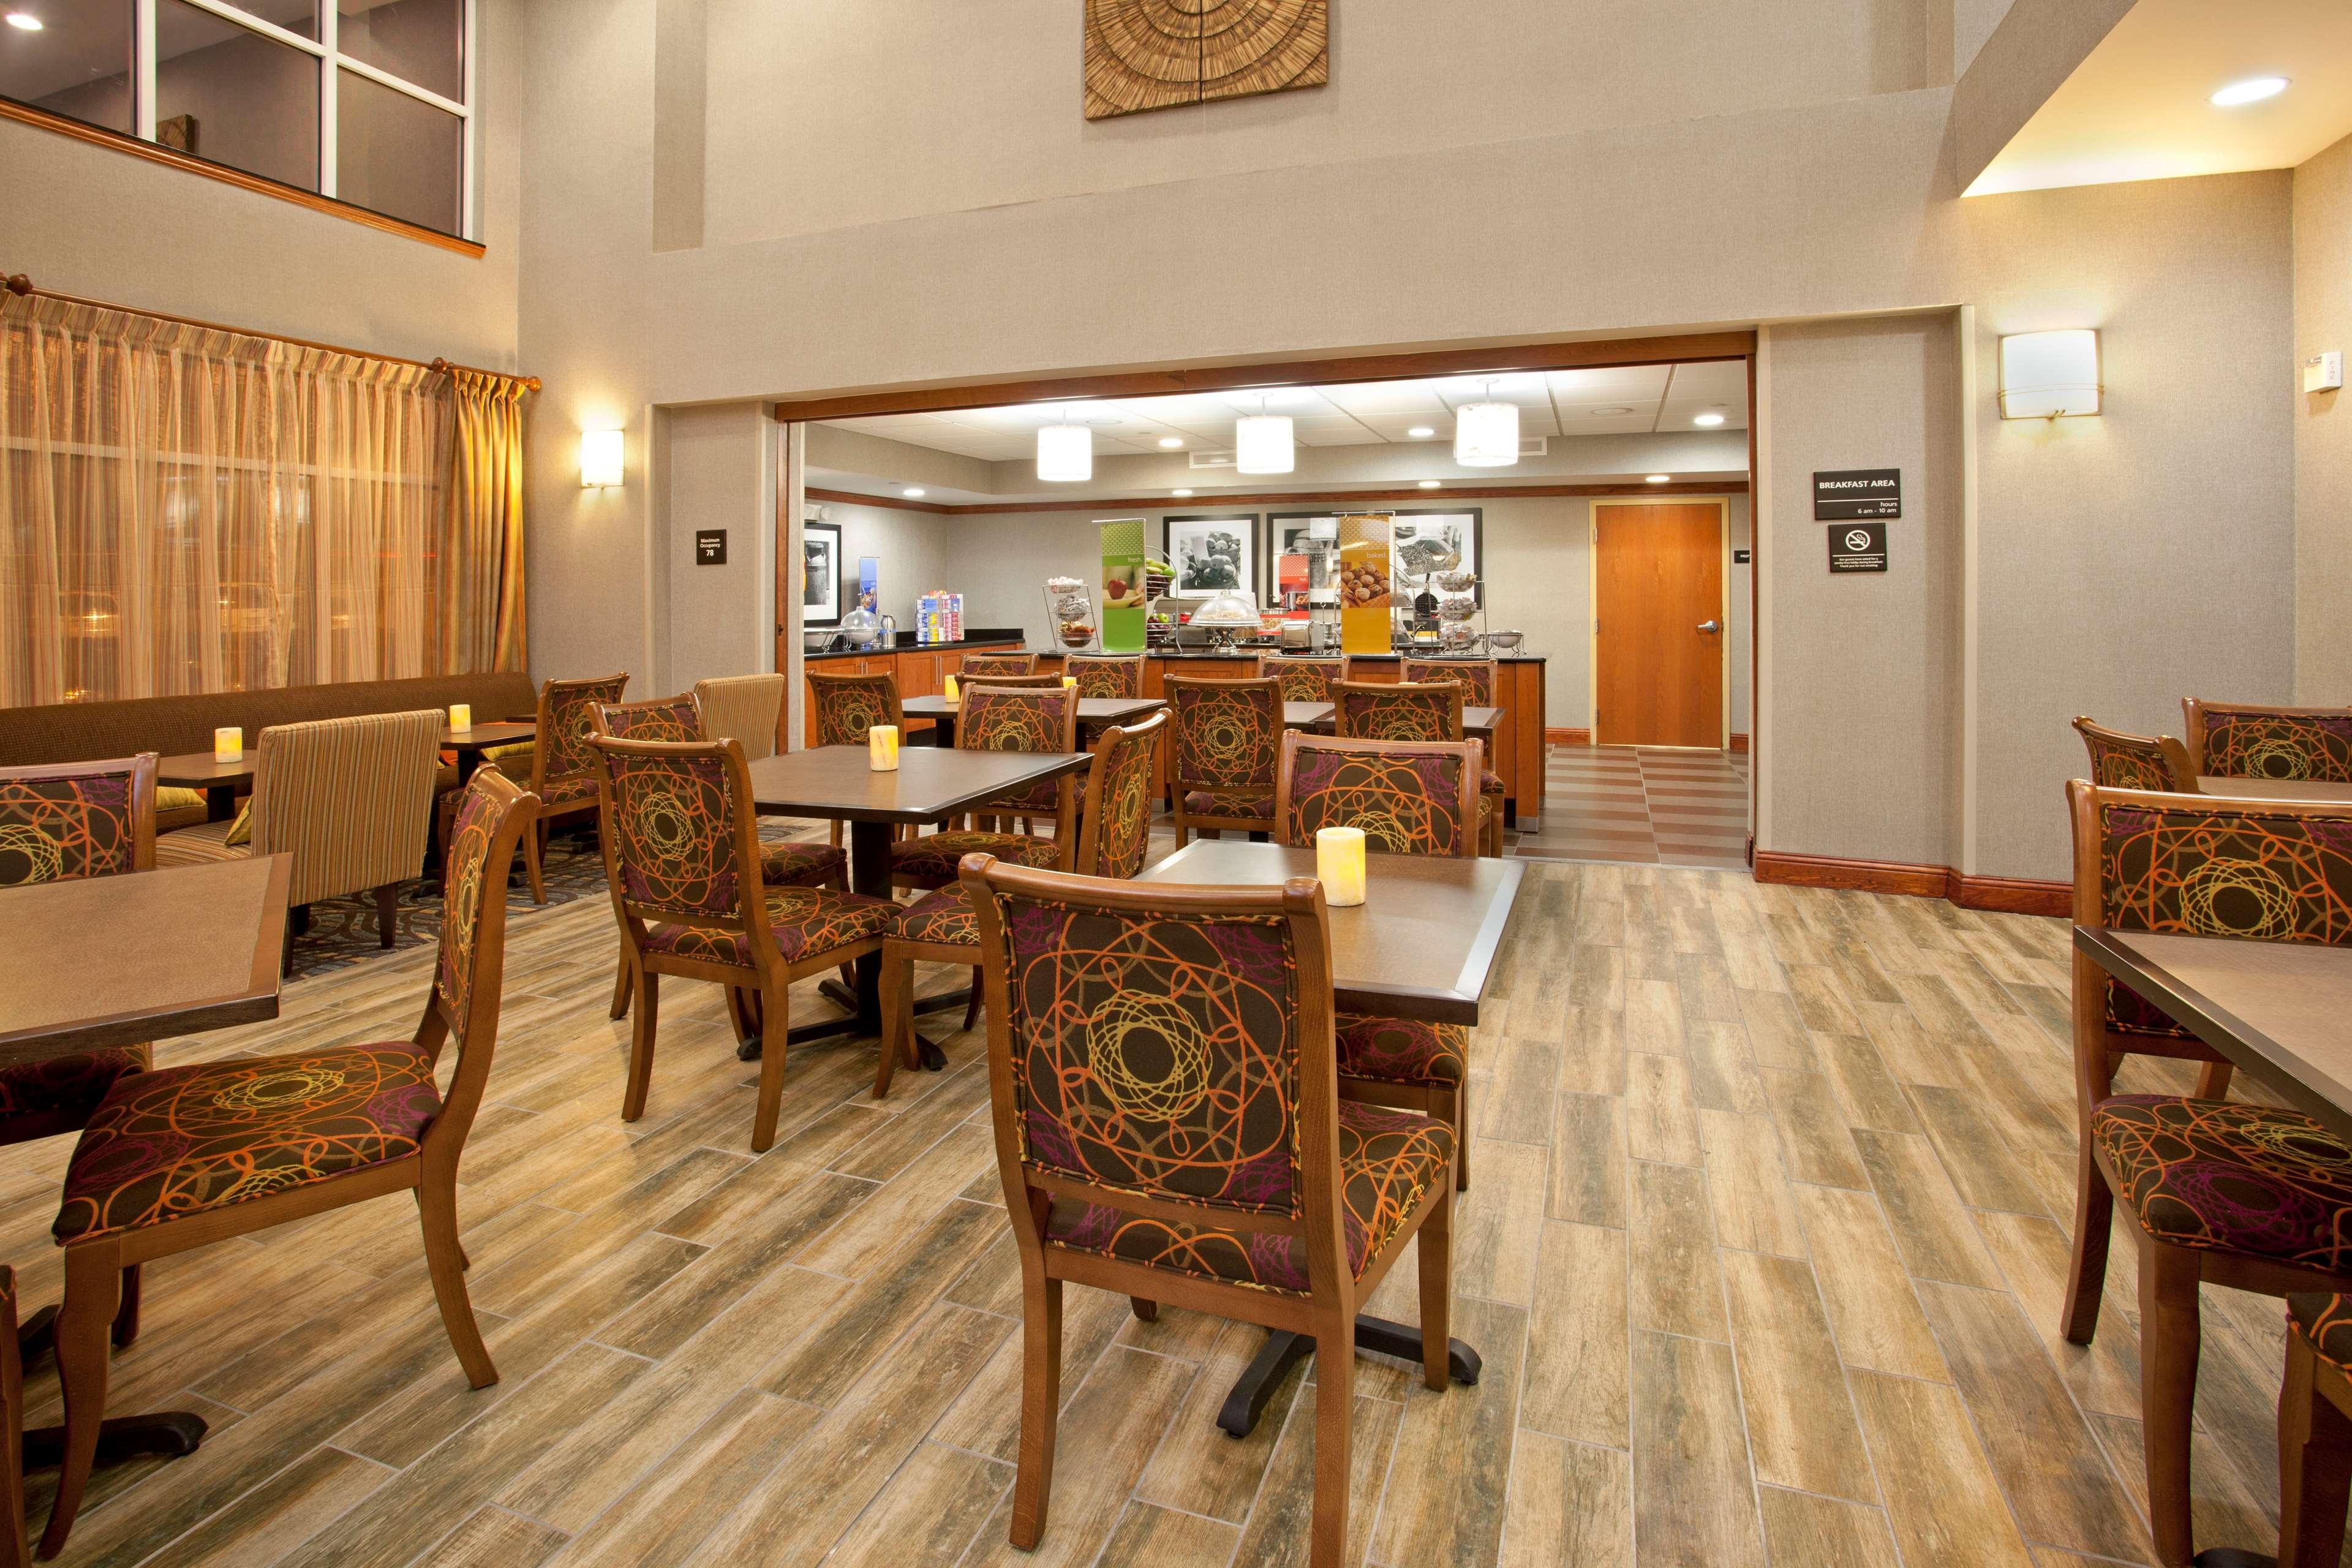 Hampton Inn & Suites Fort Worth-West-I-30 image 10